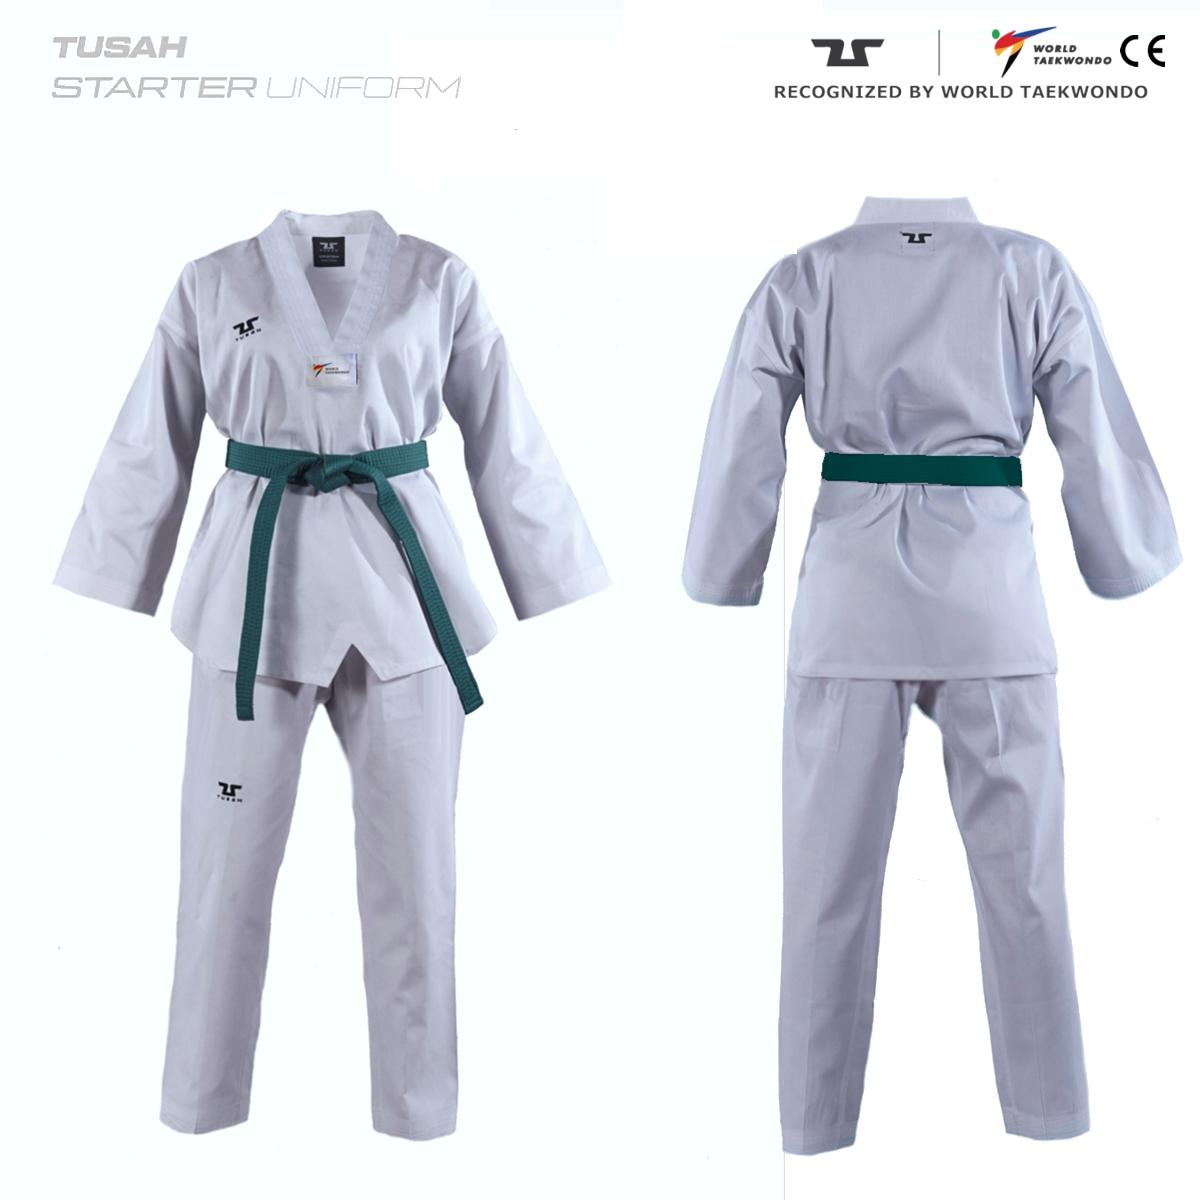 Adults World Taekwondo White Collar Tusah Taekwondo Range Uniform